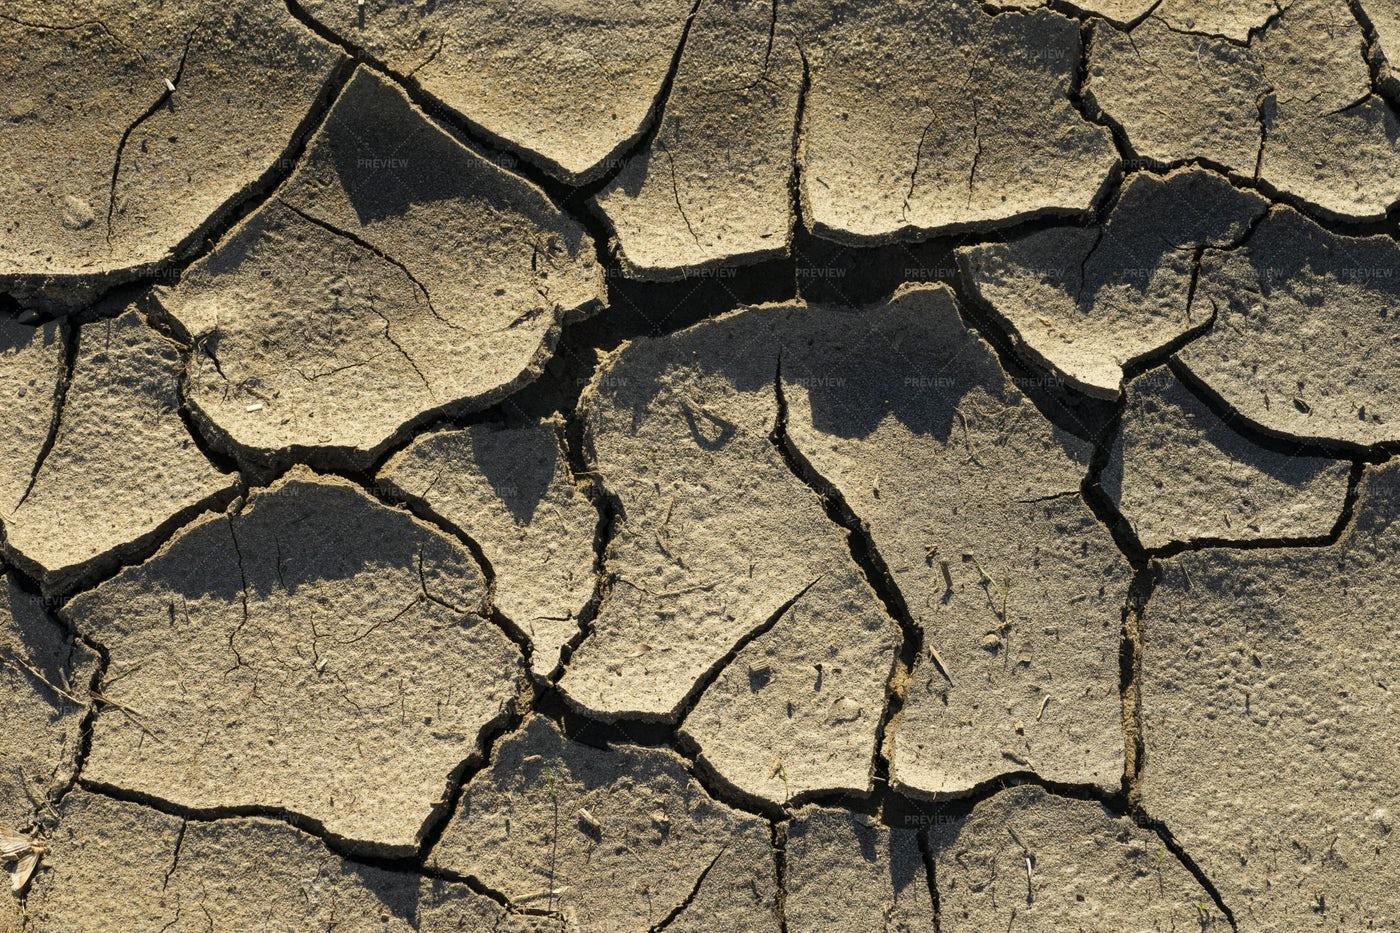 Cracking Dry Soil: Stock Photos